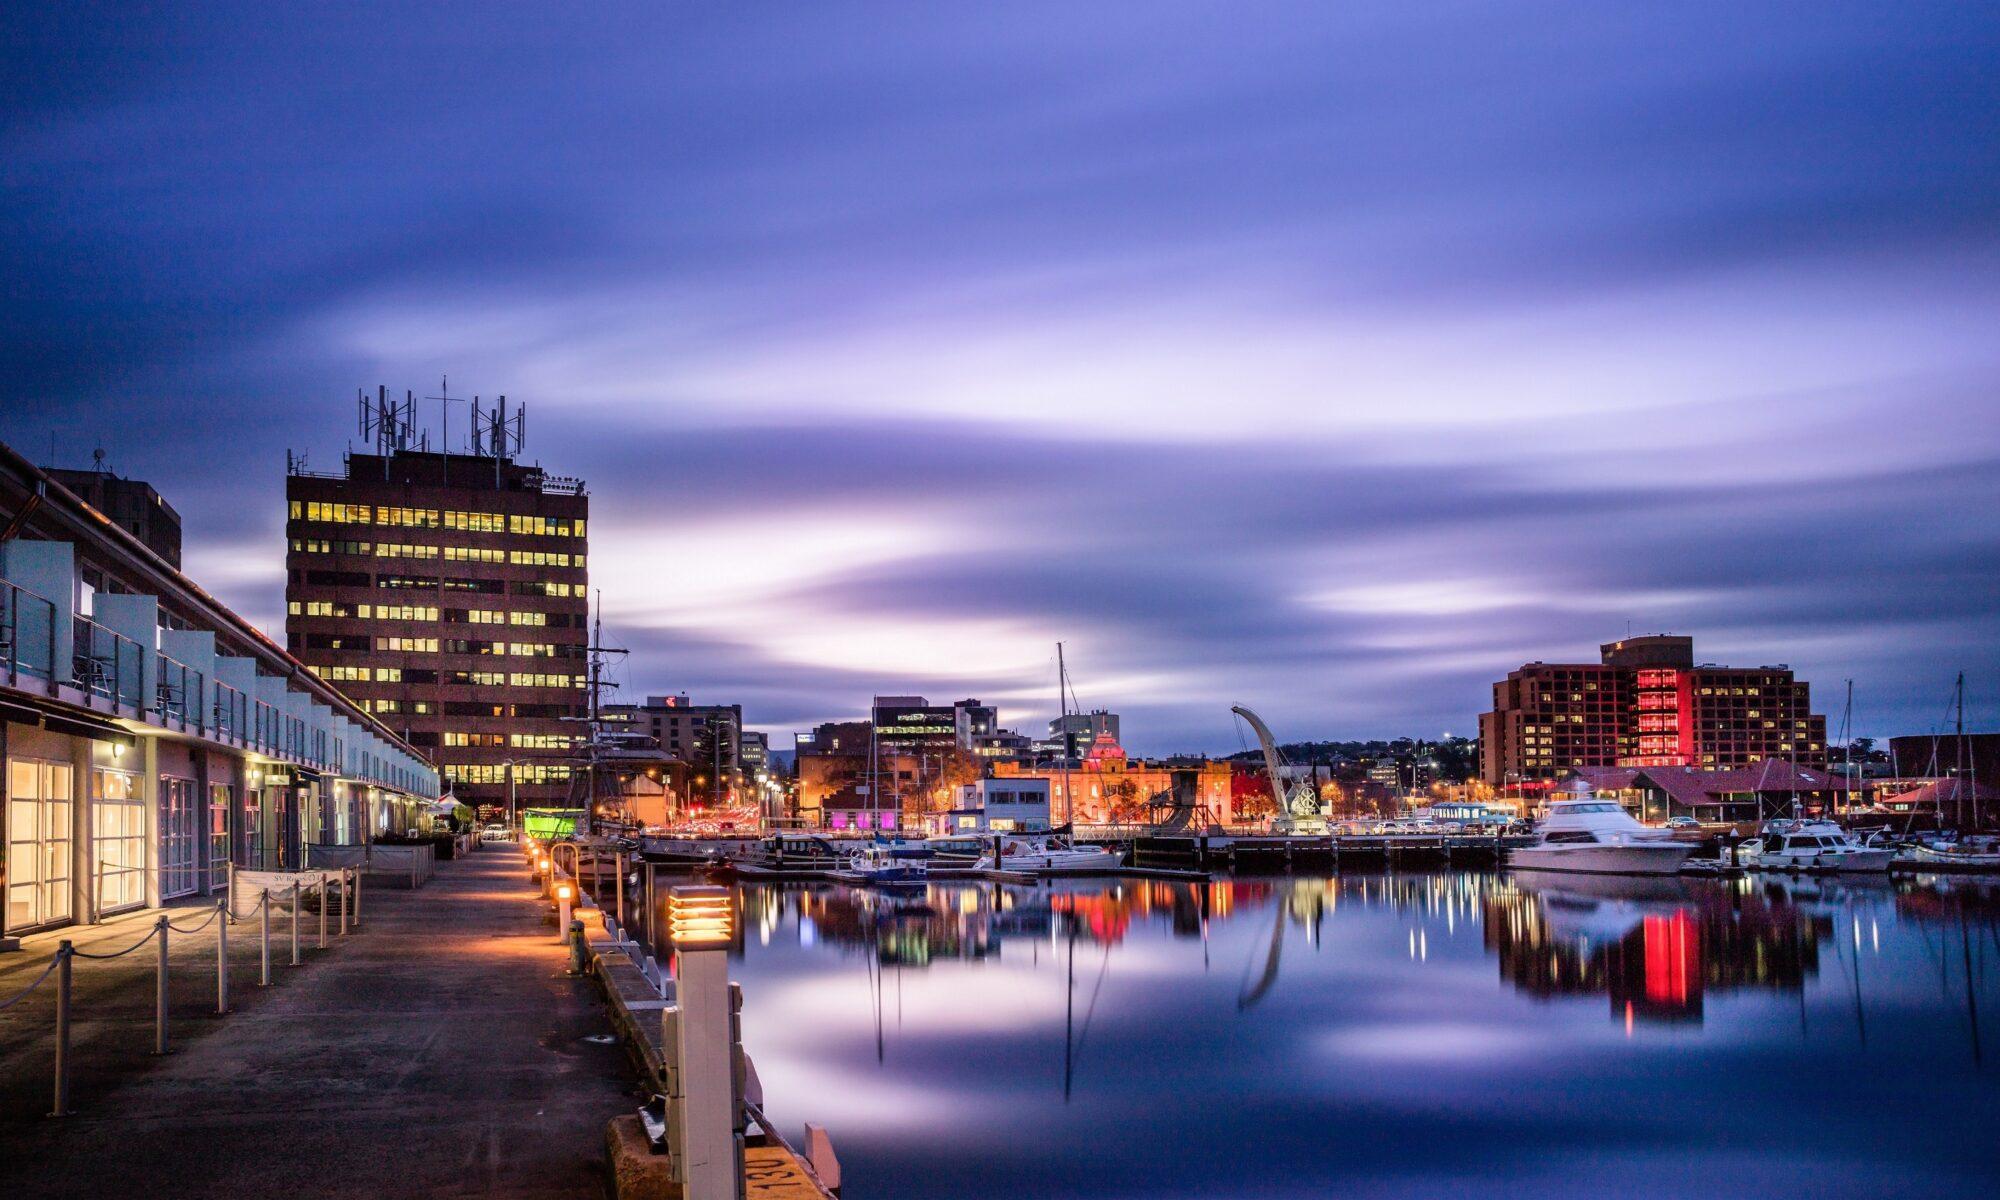 Hotels in Hobart Tasmania